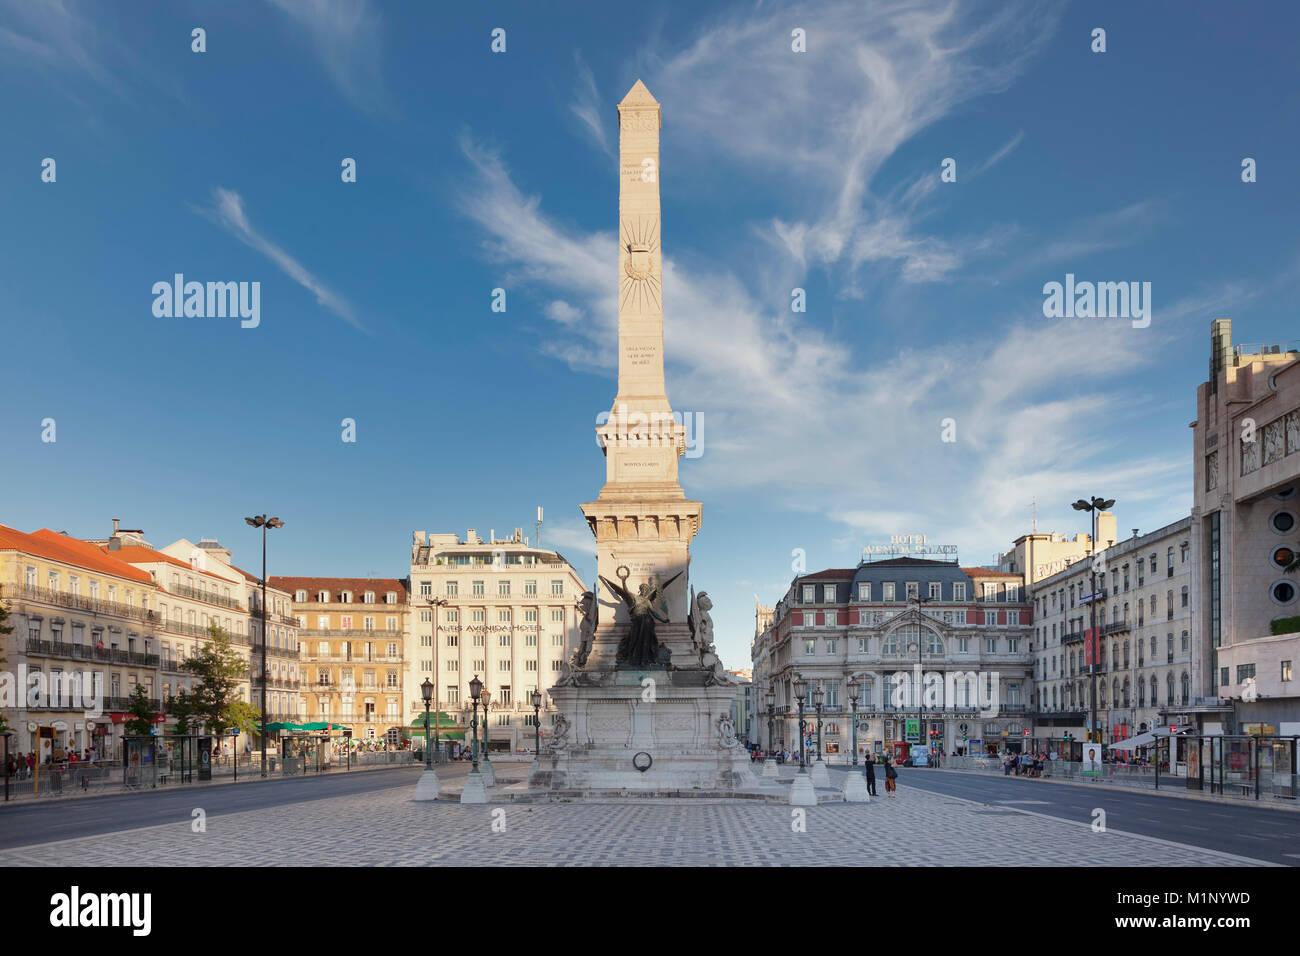 Praca dos Restauradores, Obelisk, Avenida da Liberdade, Lisbon, Portugal, Europe - Stock Image